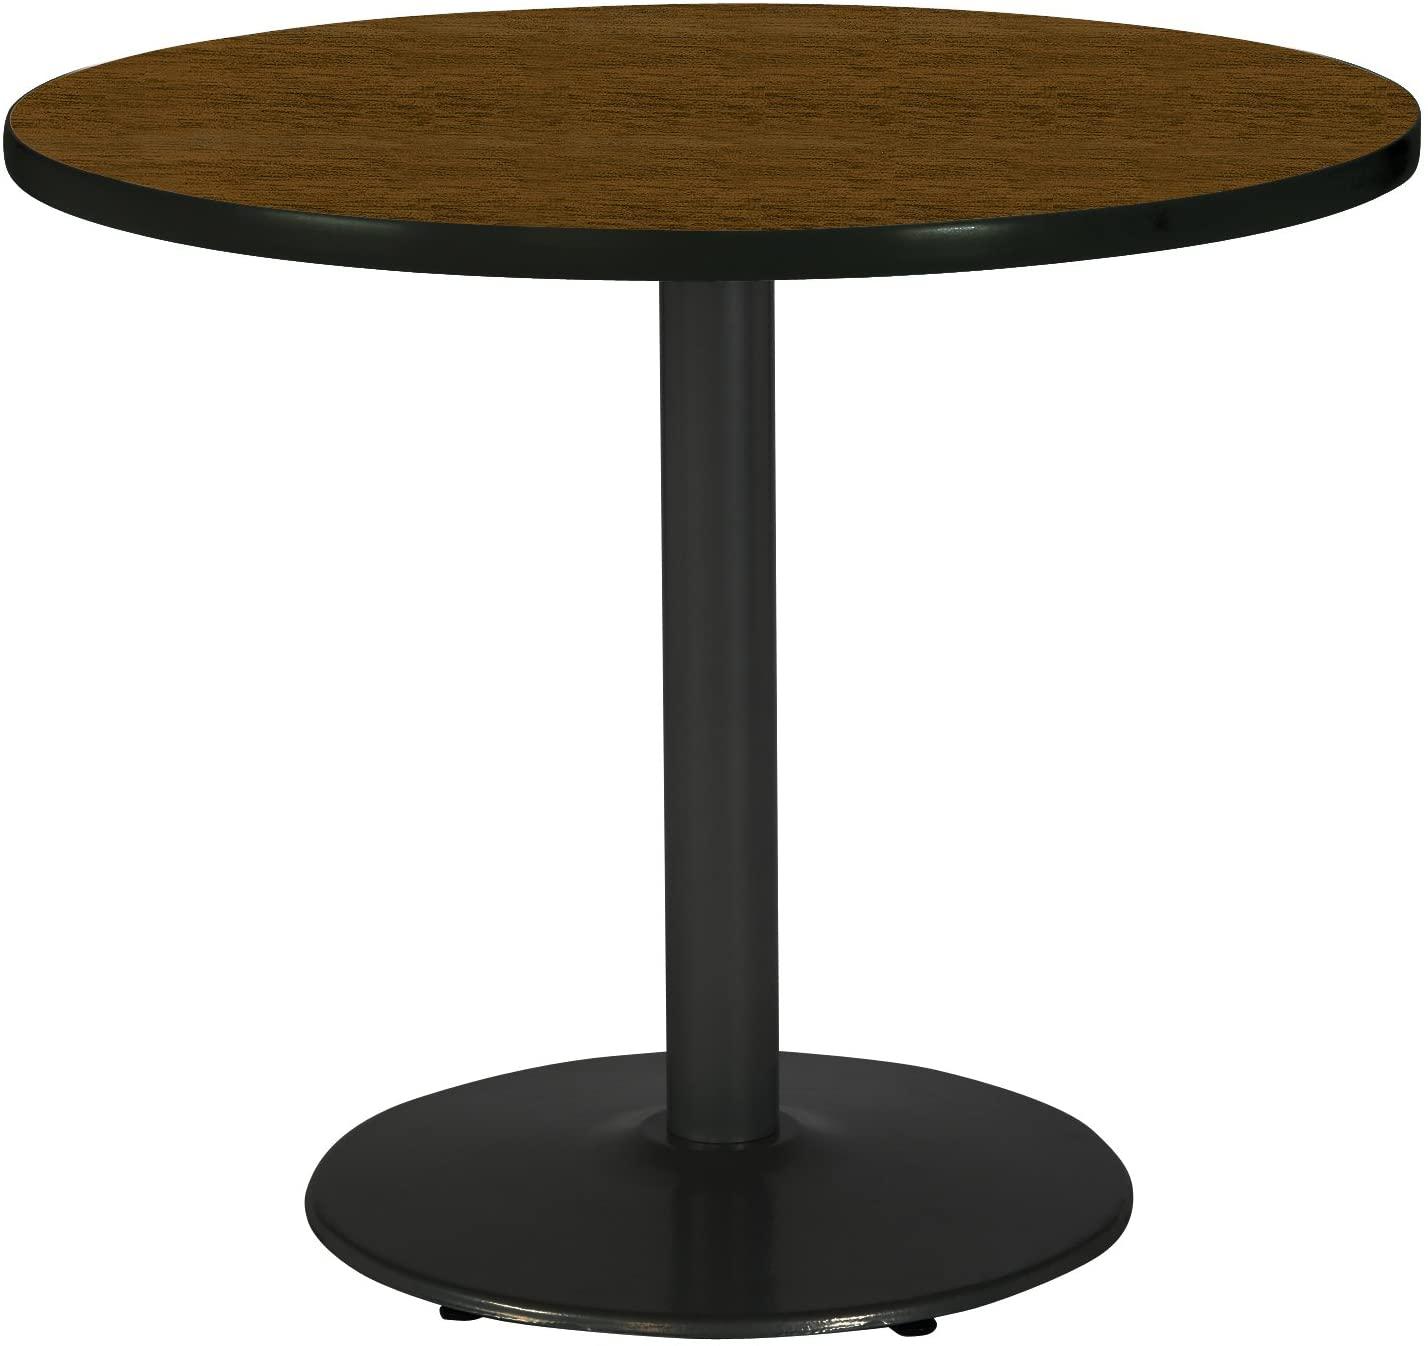 KFI Seating Round Black Base Pedestal Table with Top, Walnut, 42